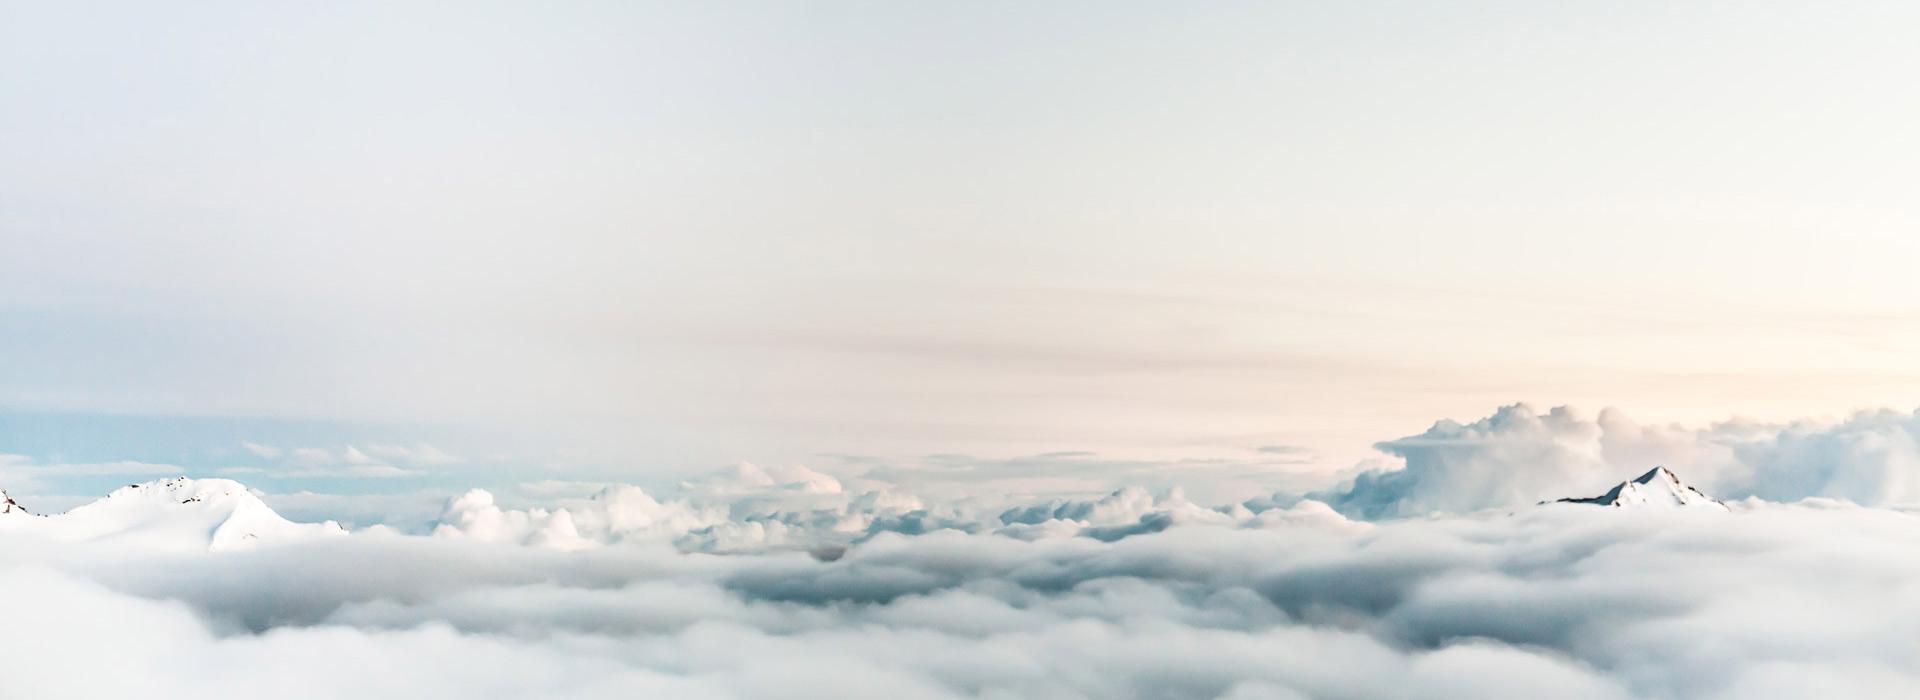 Legacy modernization to the cloud